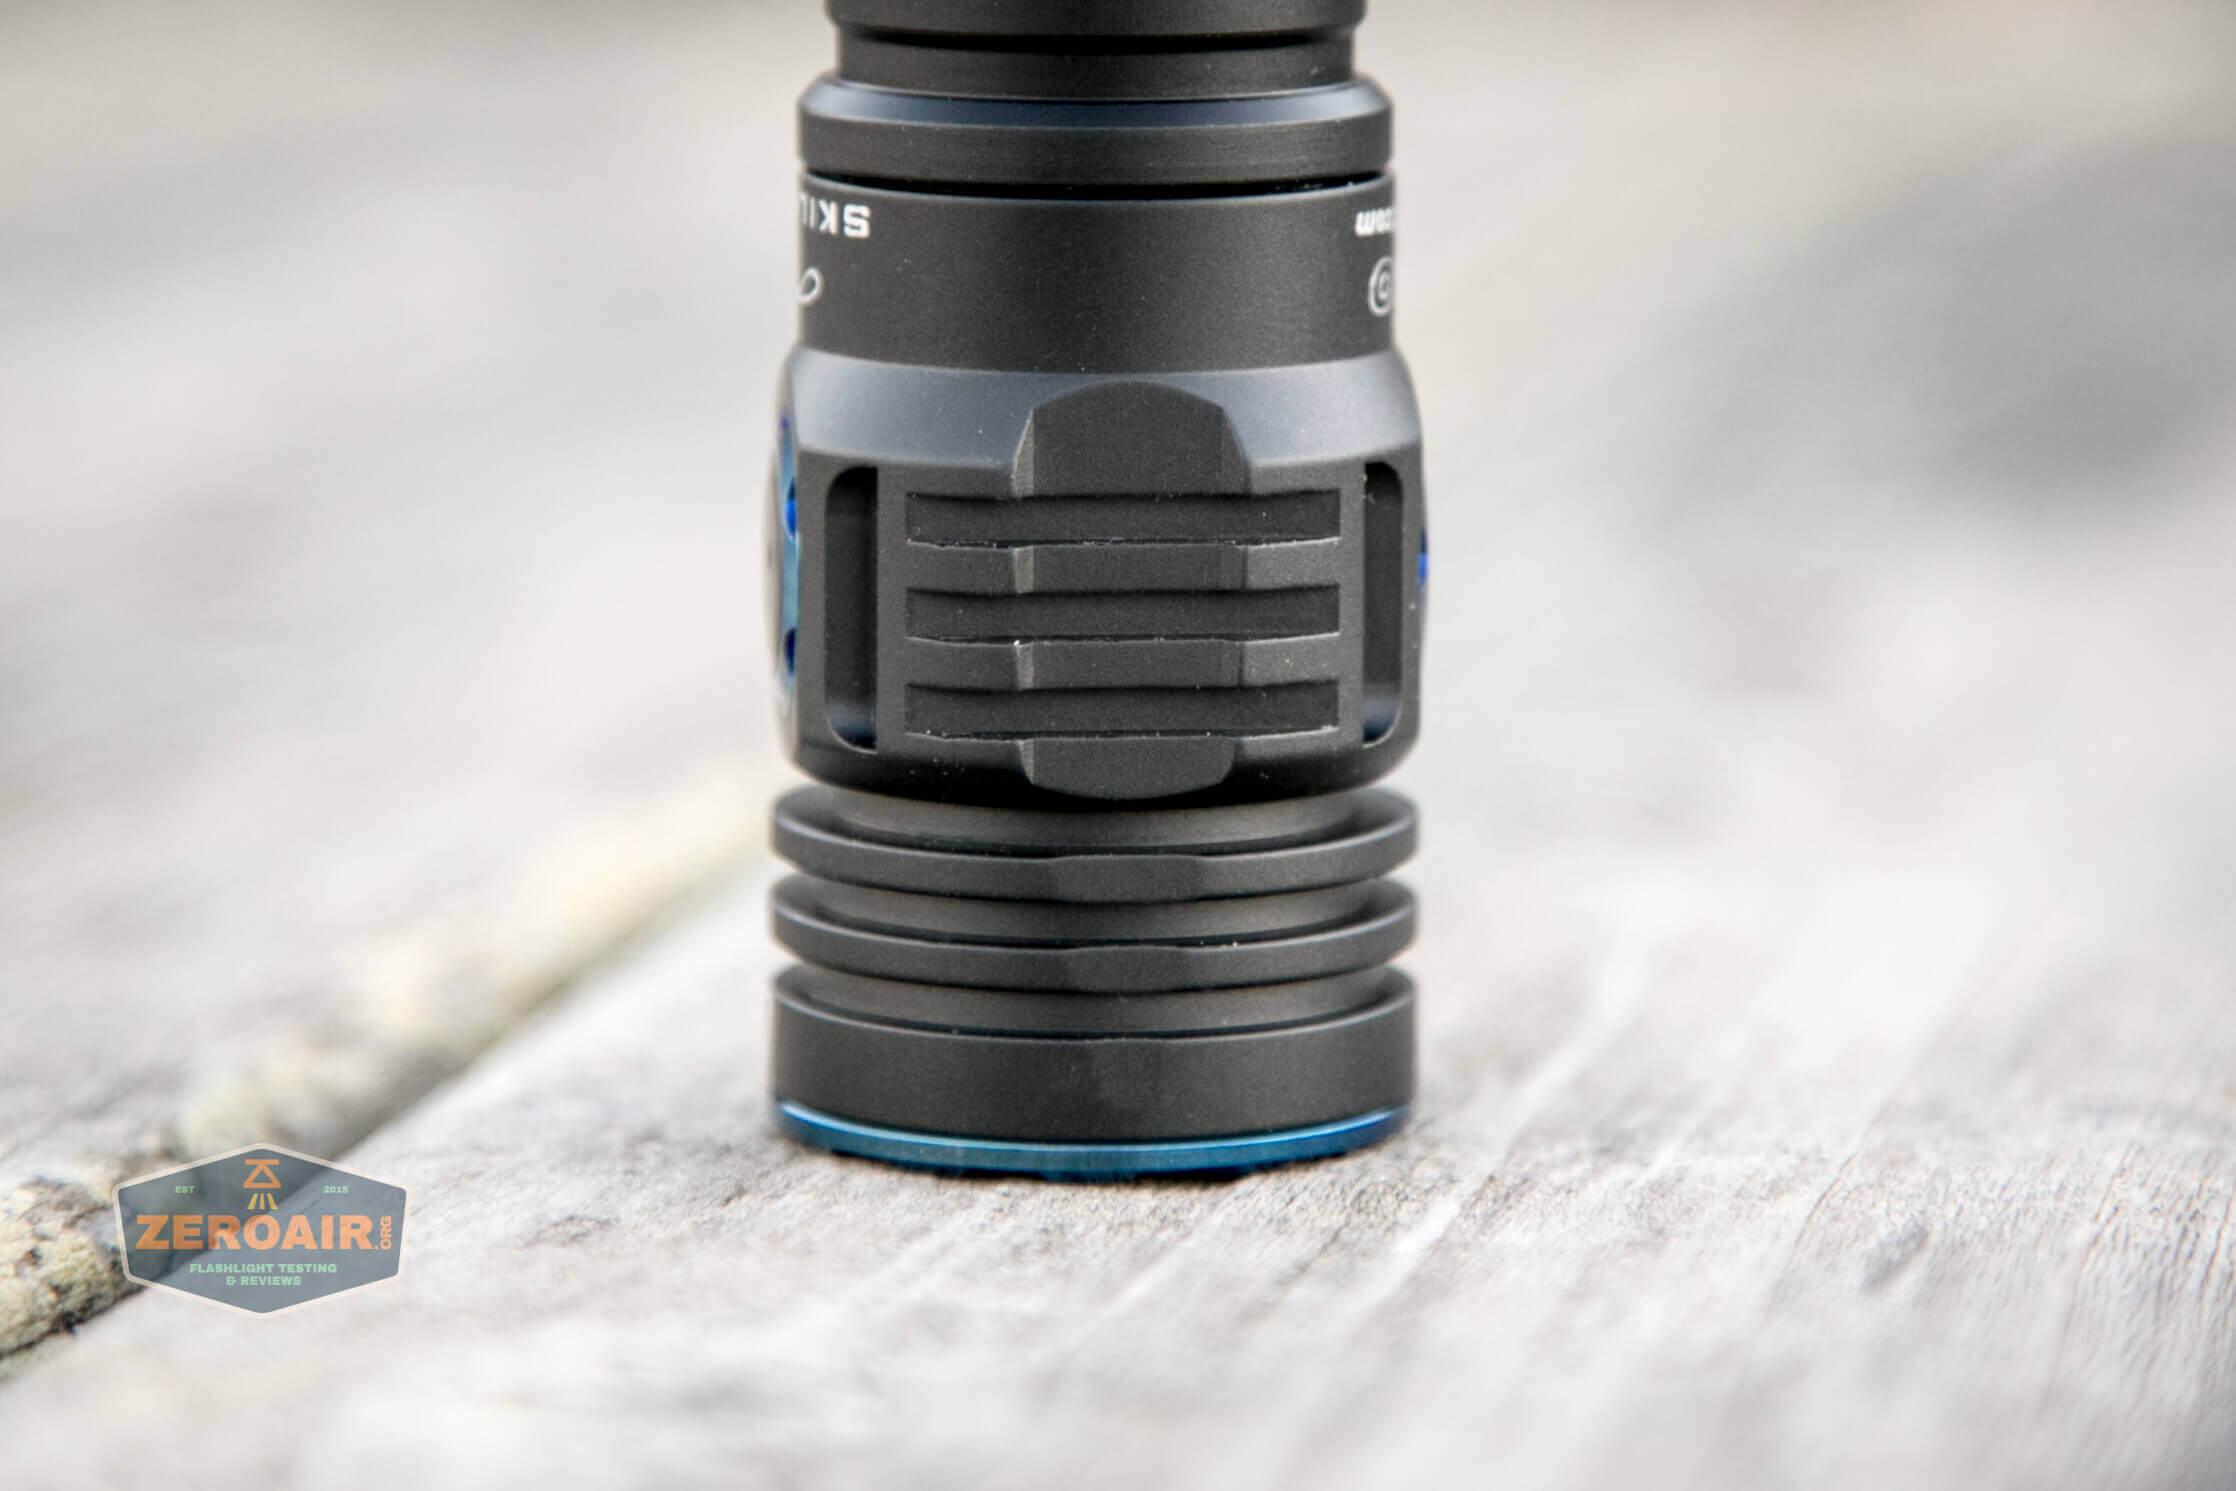 skilhunt m300 18650 flashlight headstanding